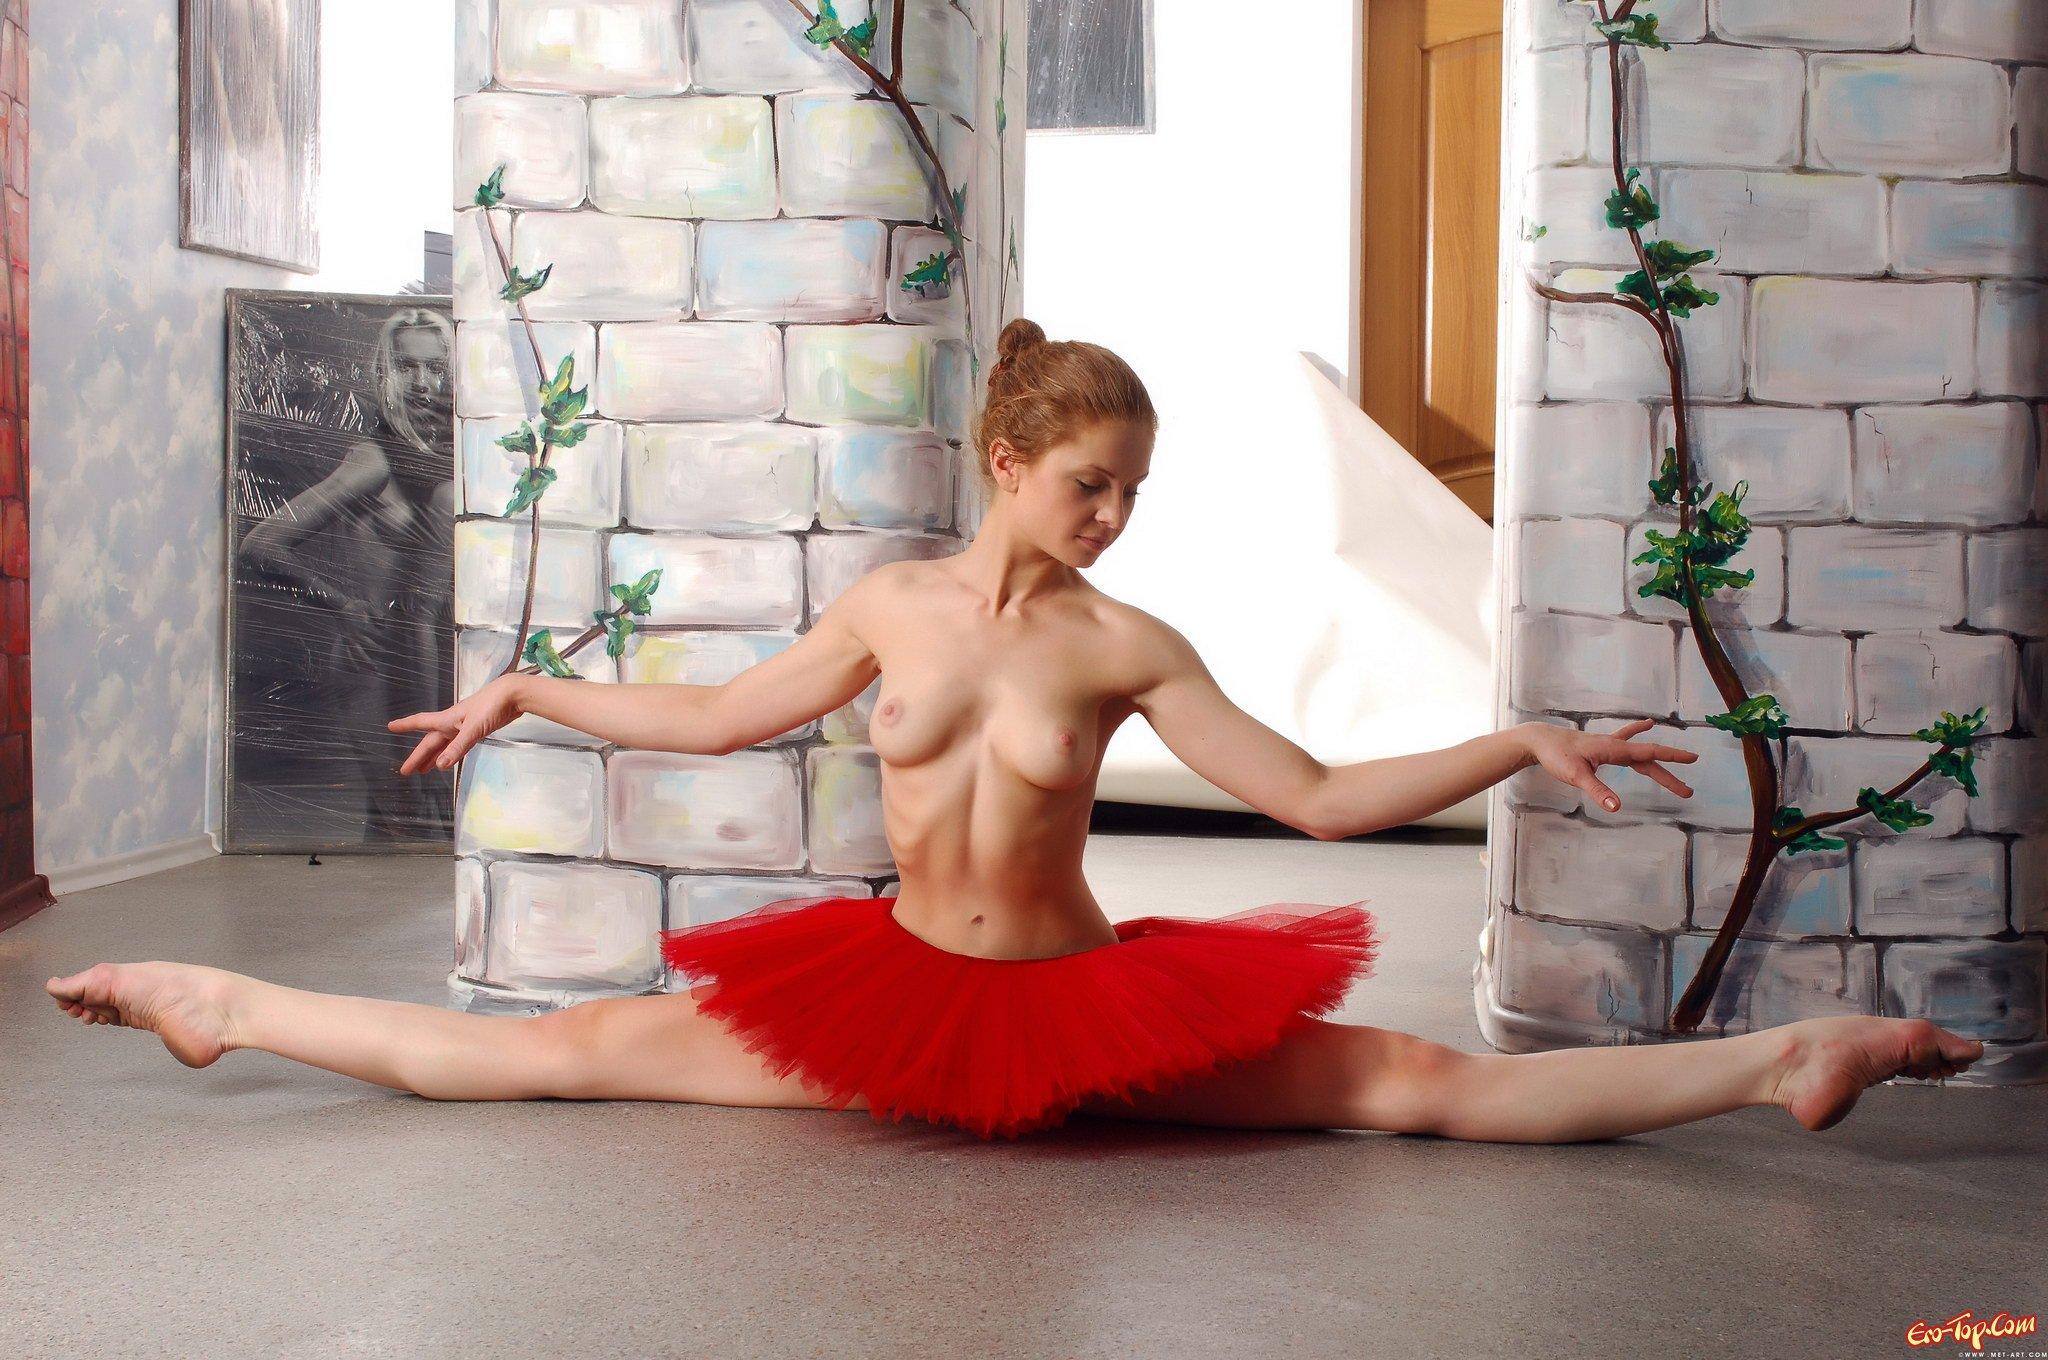 Фото балет эротический шпагат — img 11